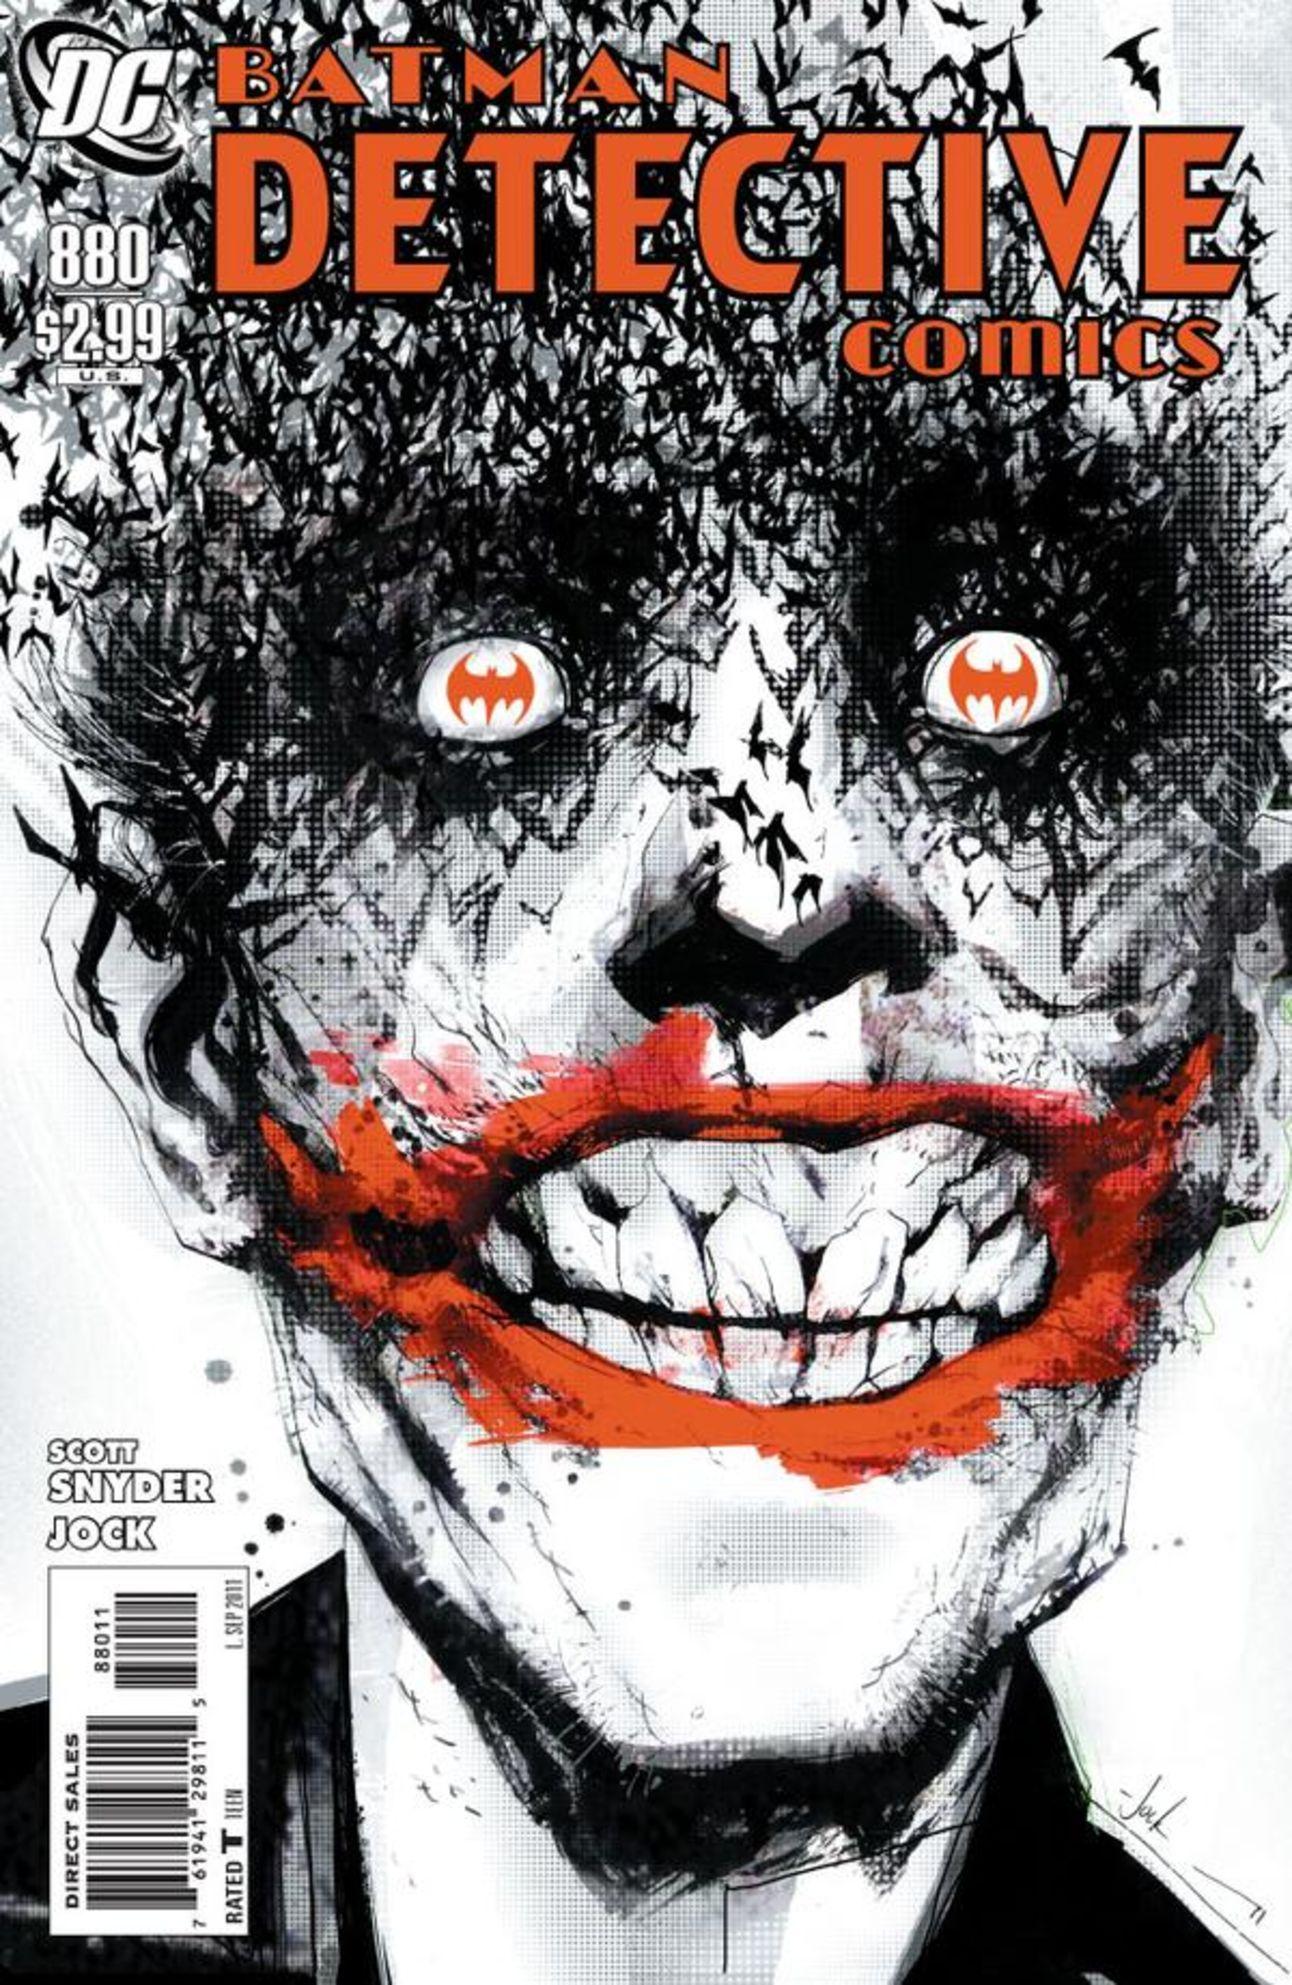 2011-detective-comics-880.jpg